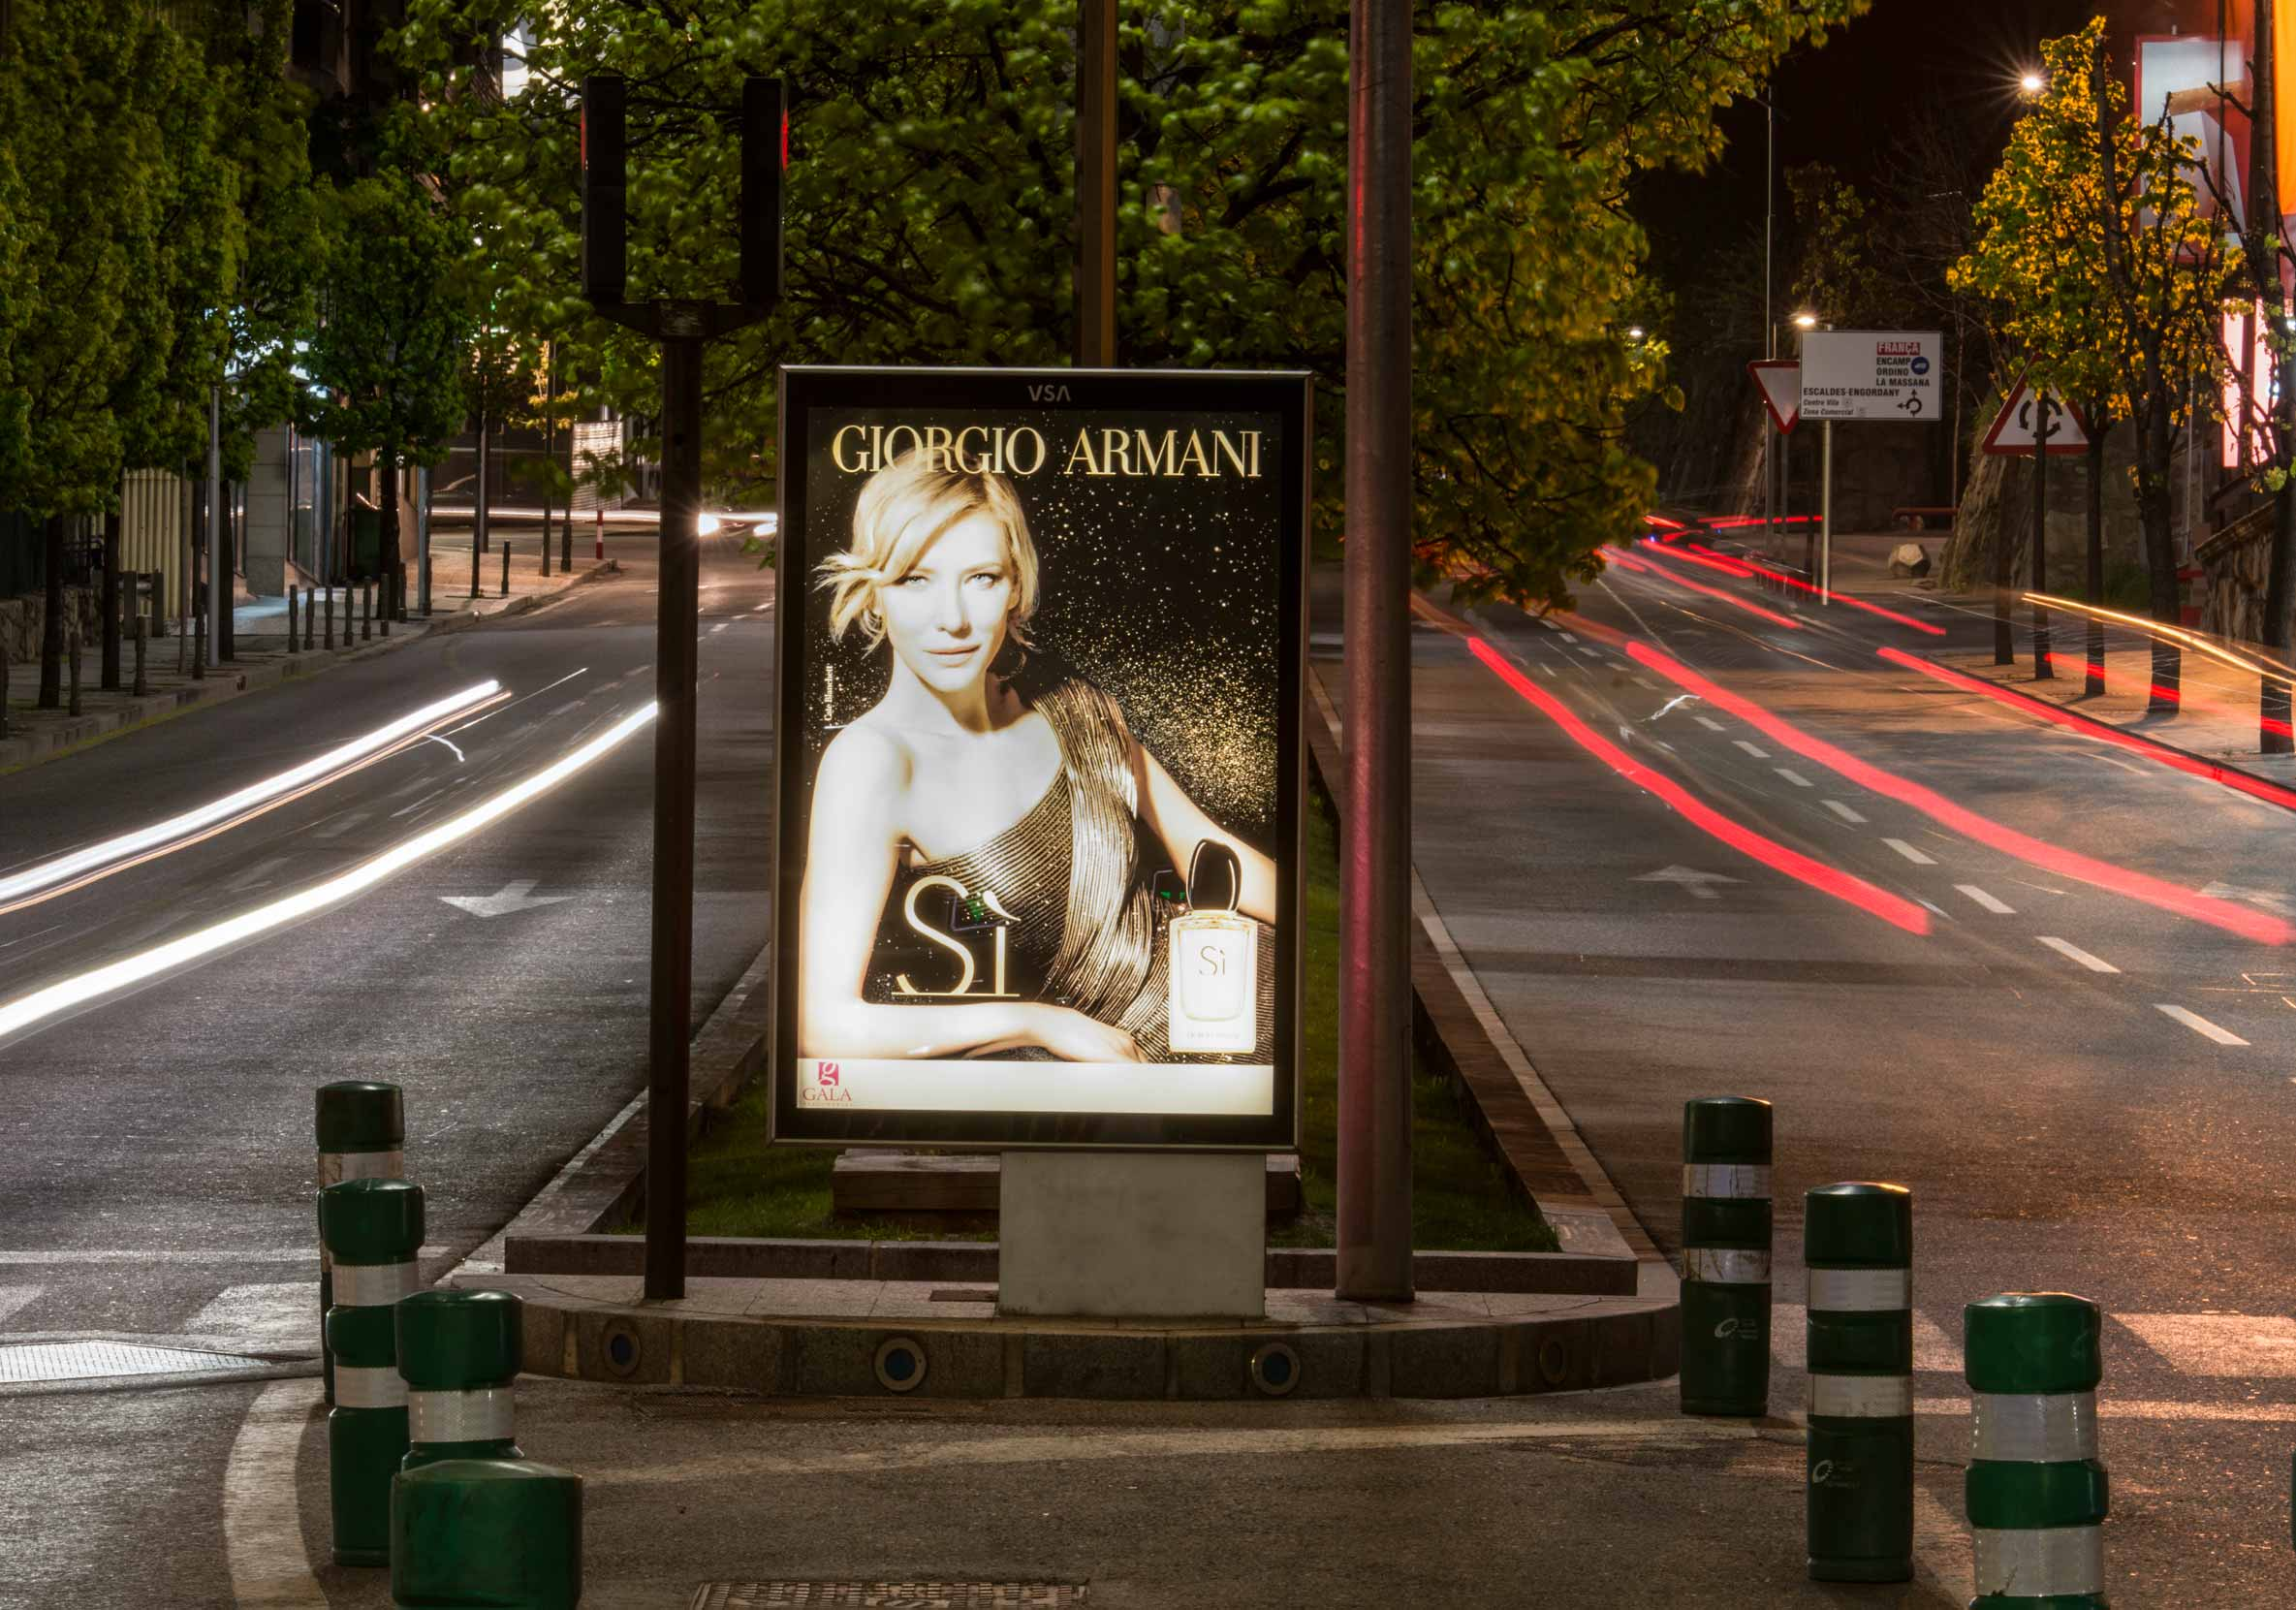 mobiliario-urbano-oppi-publicidad-exterior-perfumerias-gala-si-giorgio-armani-noche-andorra-vsa-comunicacion